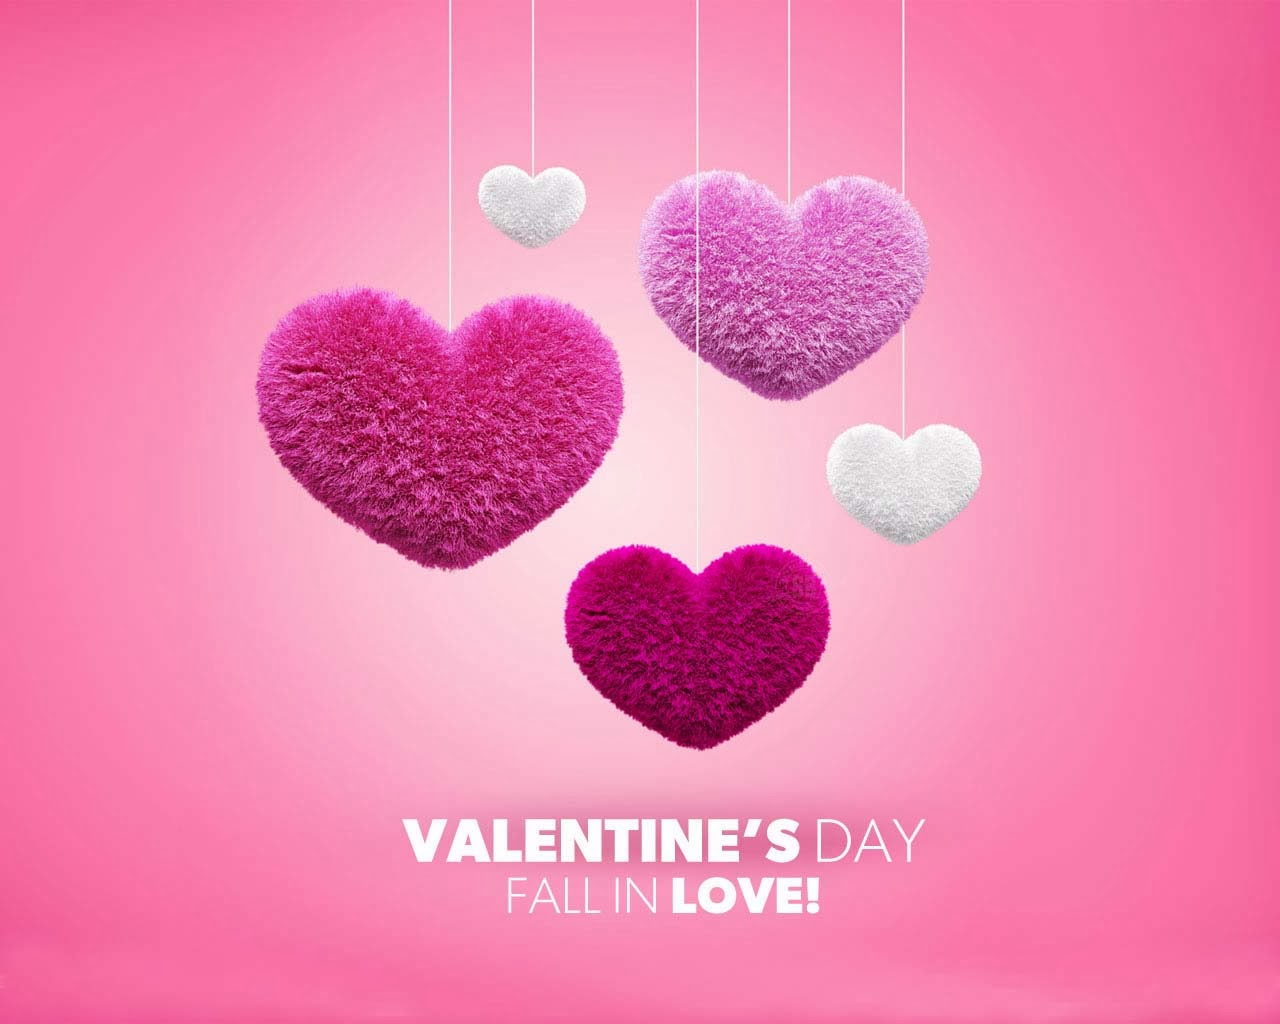 valentine-day-i-love-you